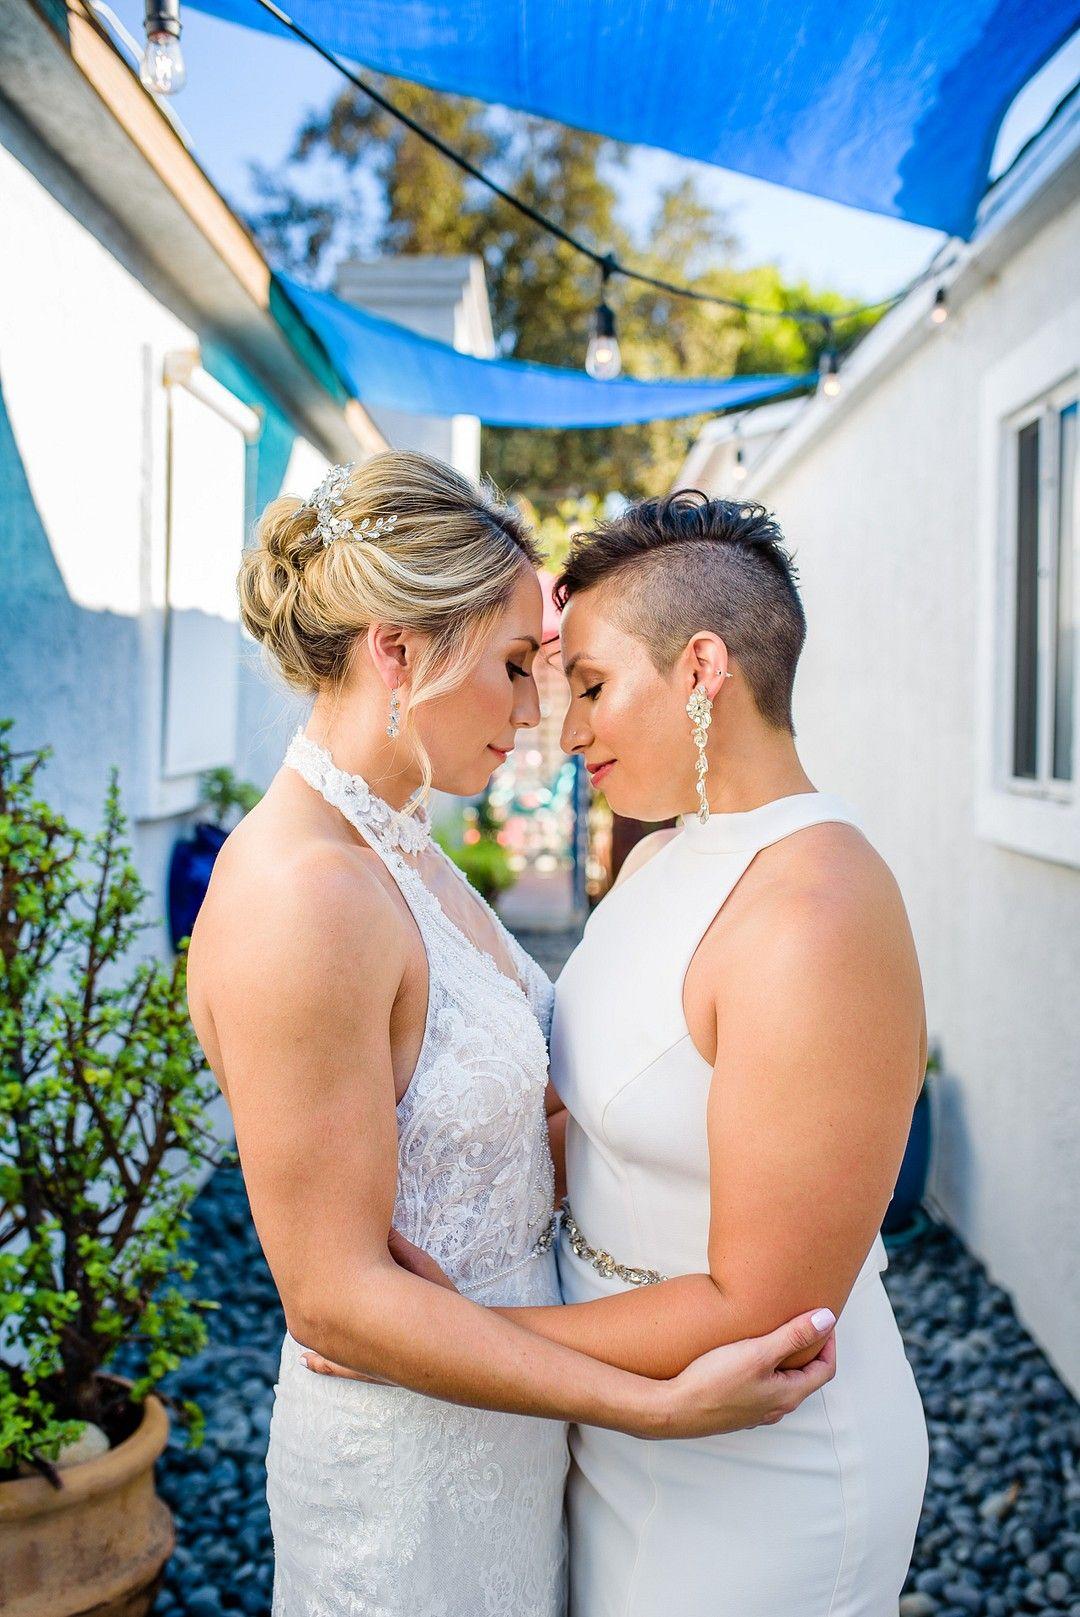 Intimate Sunset Beach Wedding Ceremony In La Jolla